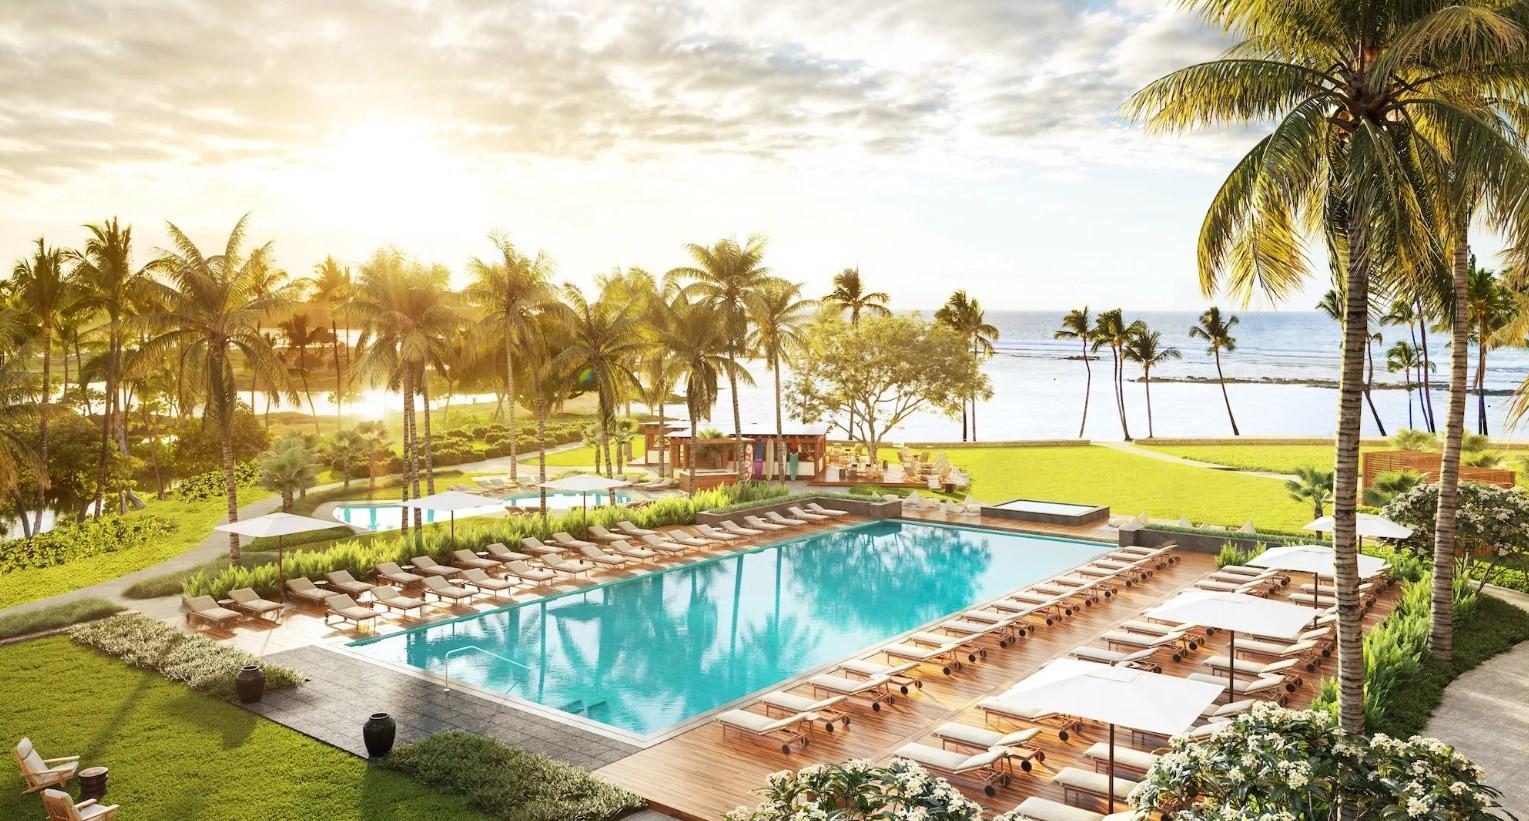 news-main-auberge-resorts-collection-opens-mauna-lani-resort-in-hawaii.1579258821